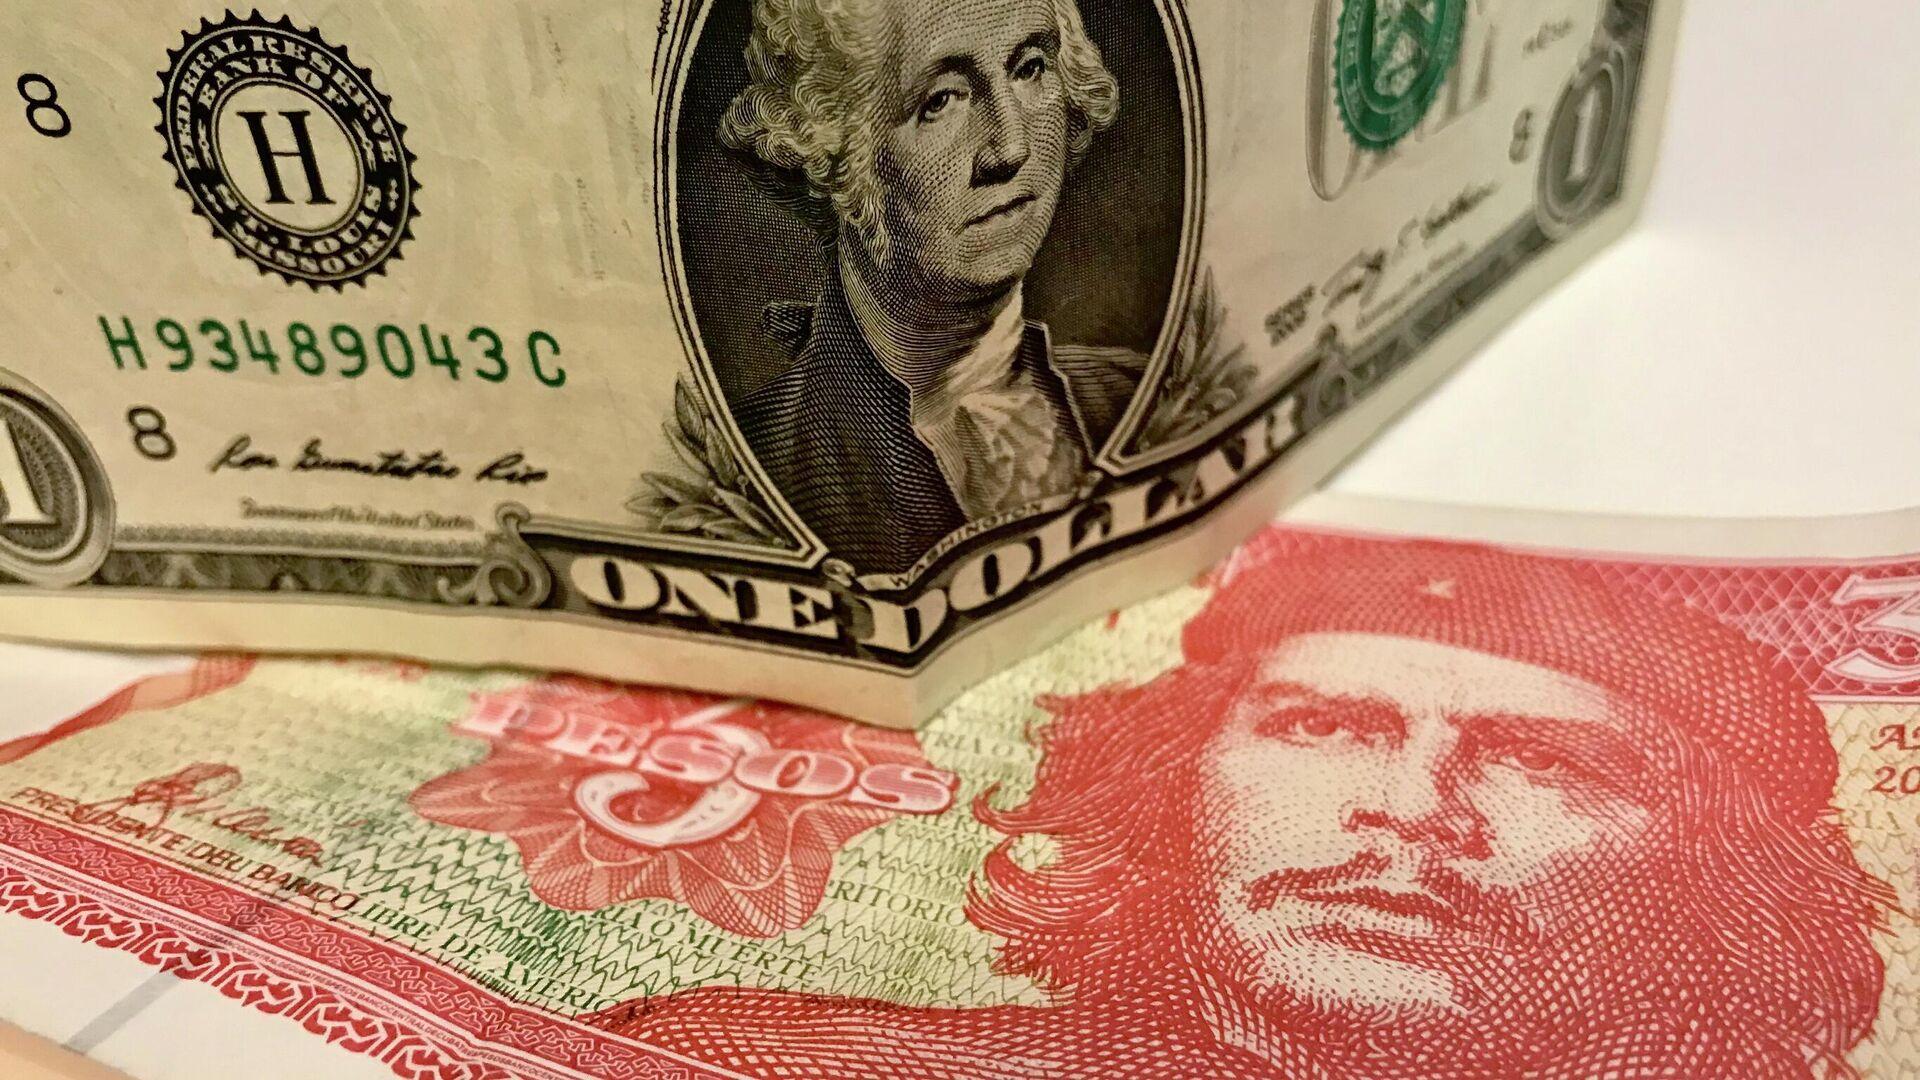 Dólar y pesos cubanos - Sputnik Mundo, 1920, 21.06.2021